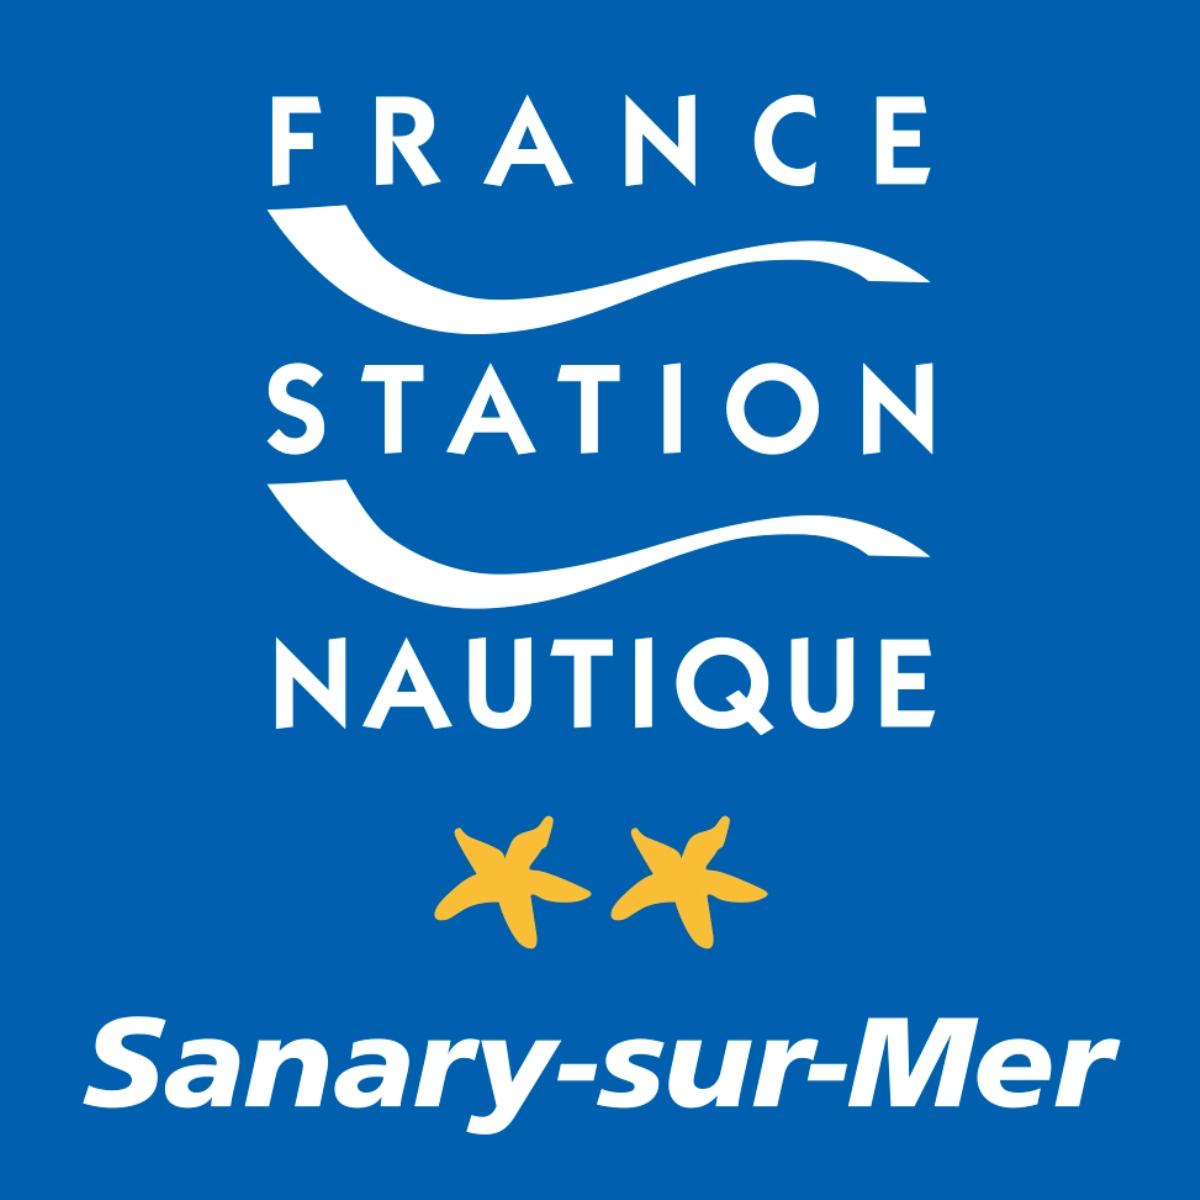 France Station Nautique - Sanary-sur-Mer